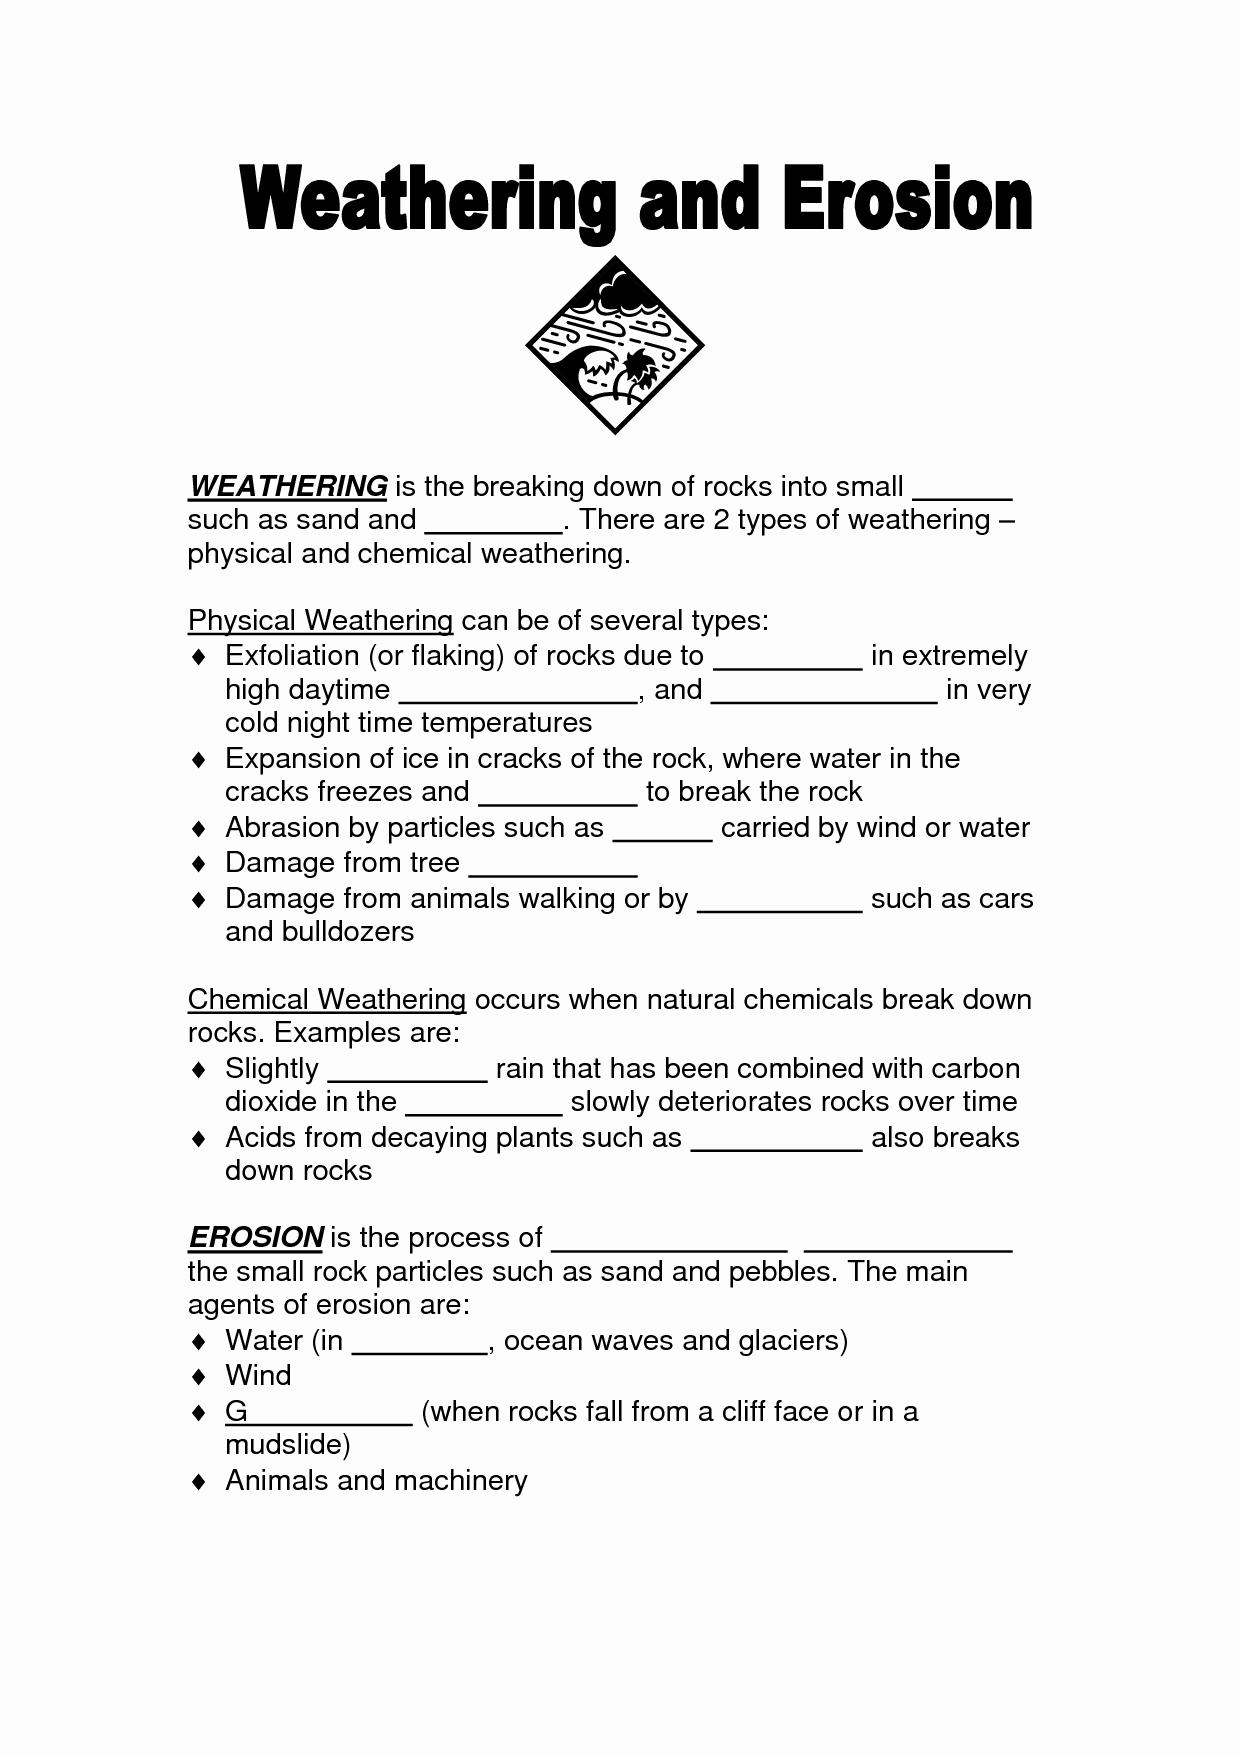 Weathering Erosion and Deposition Worksheet Elegant 16 Best Of Weathering and Erosion Worksheet